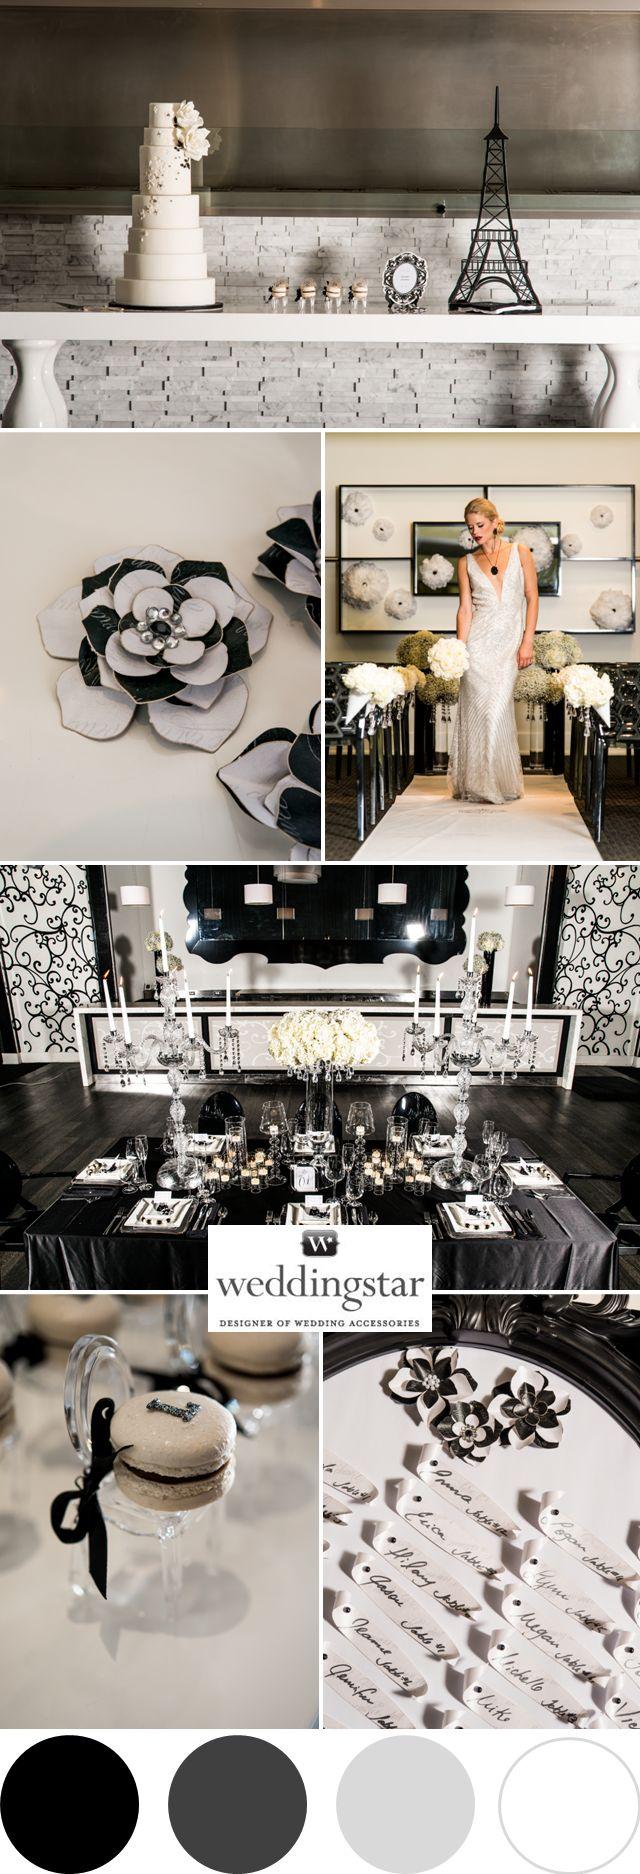 Black on black wedding decor   best Wedding Ideas images on Pinterest  Wedding ideas Boho